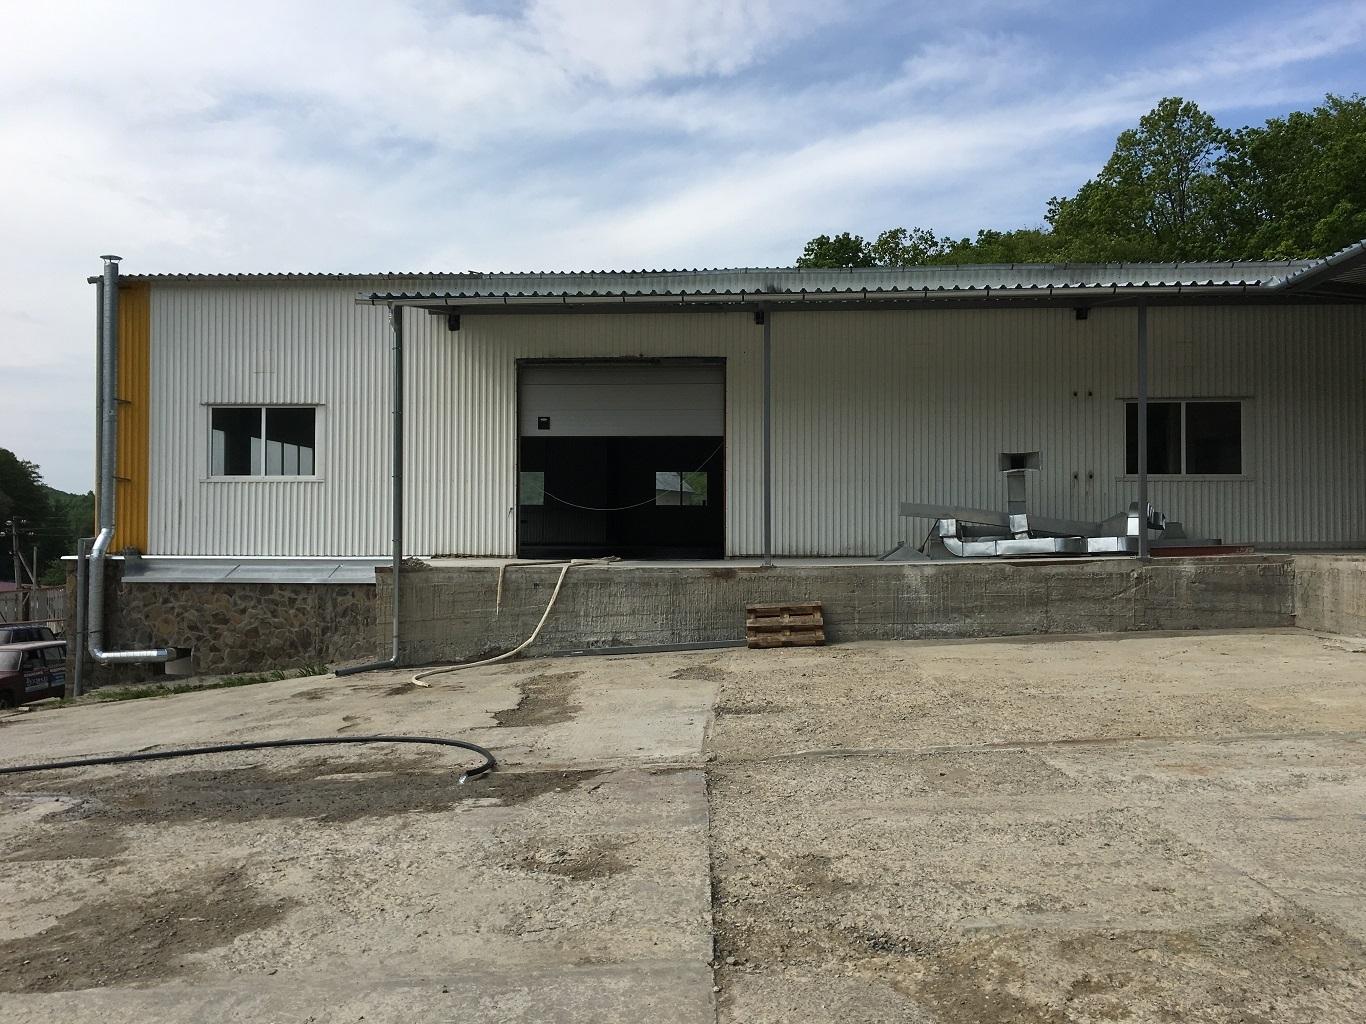 Завод розливу мінеральної води (Нижнє Солотвино, Закарпатська область)